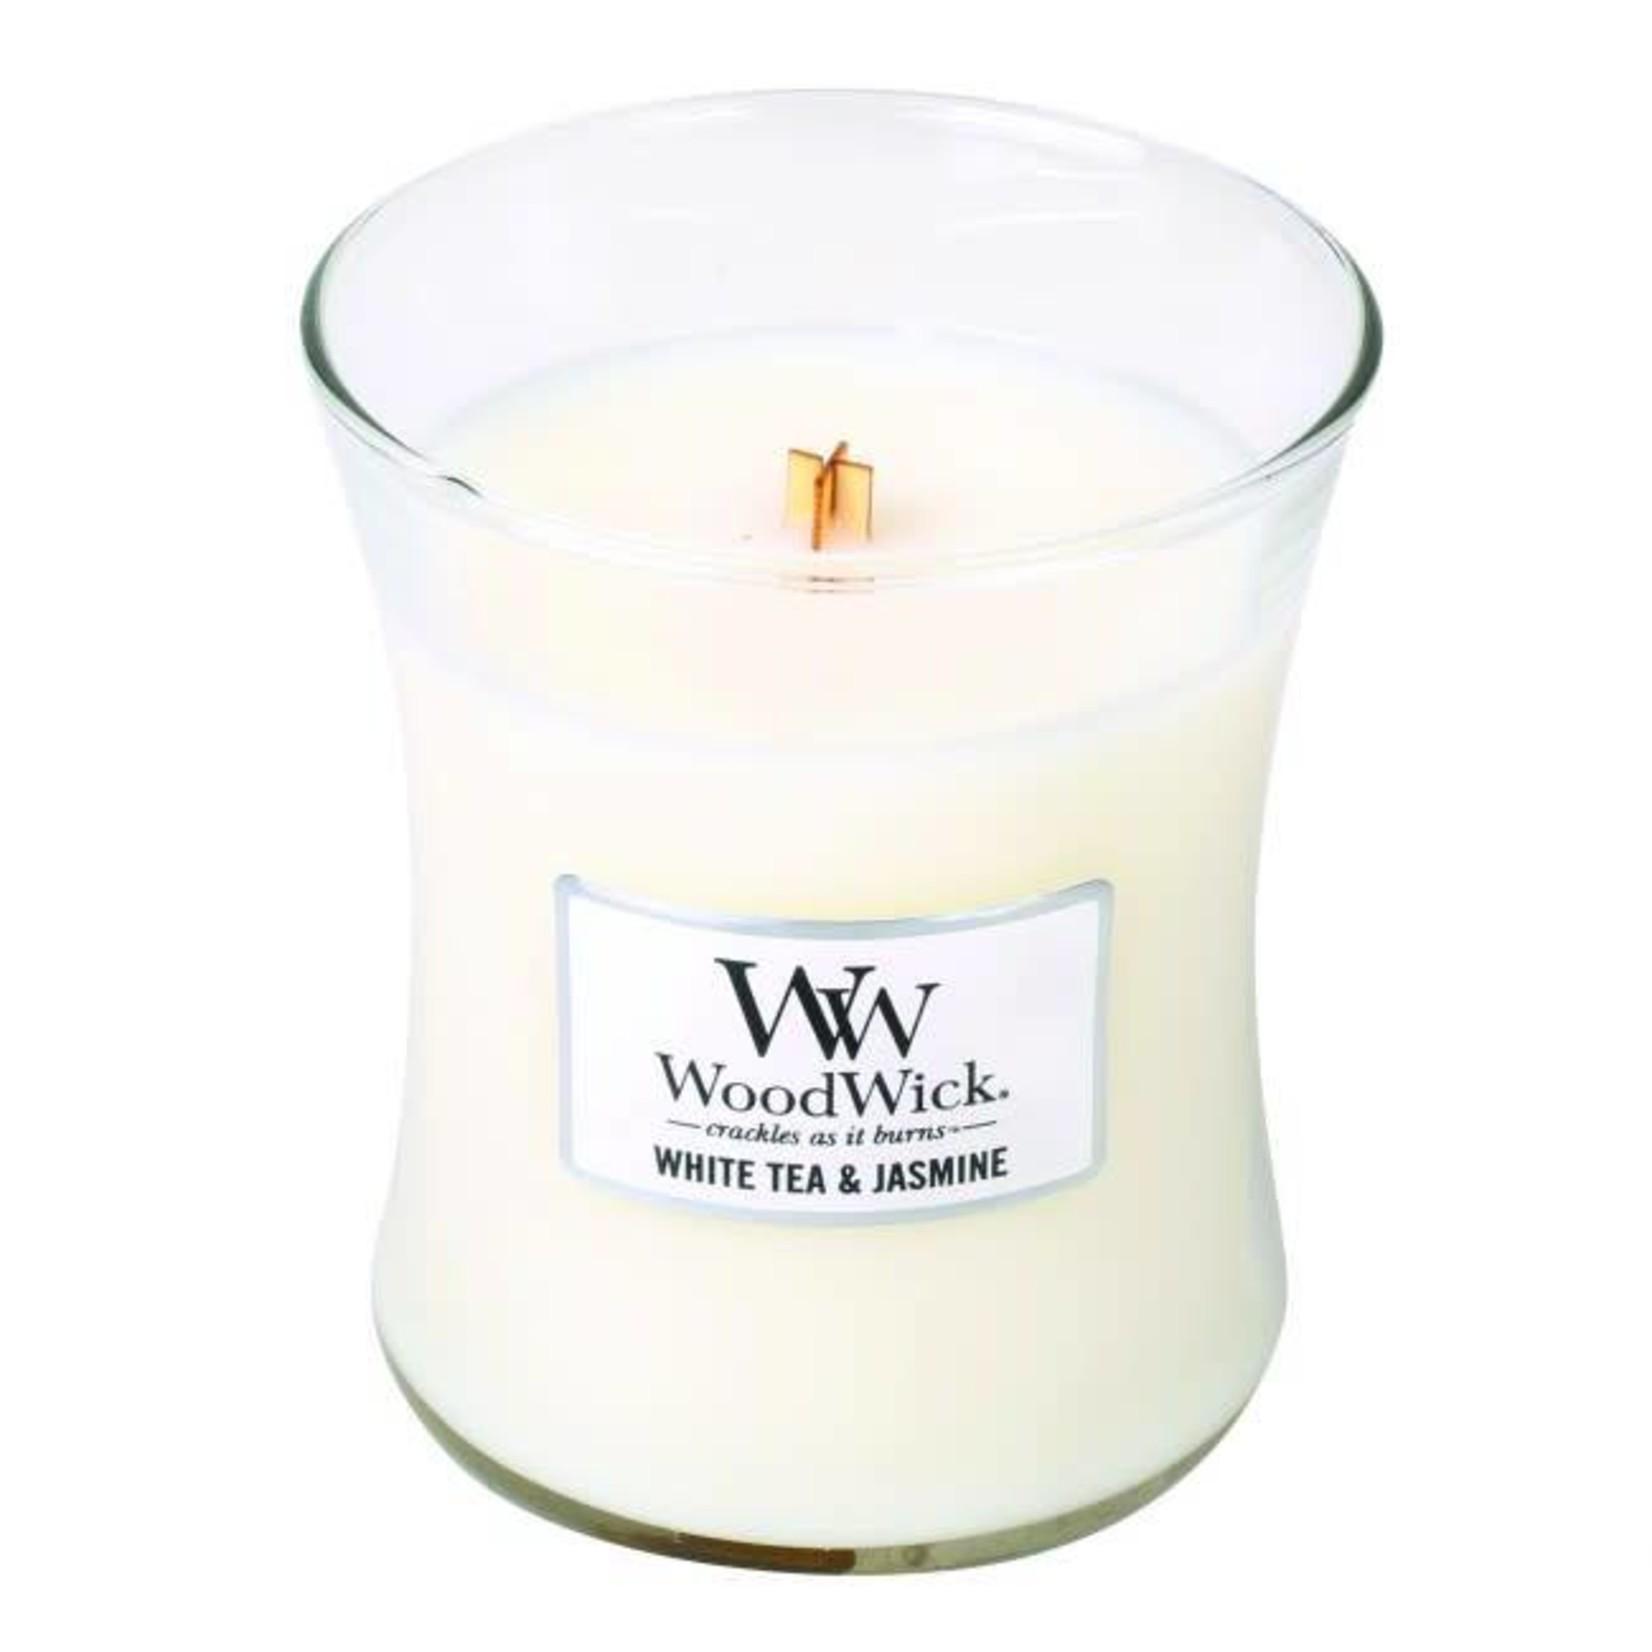 Woodwick WOODWICK WHITE TEA & JASMINE MEDIUM CANDLE